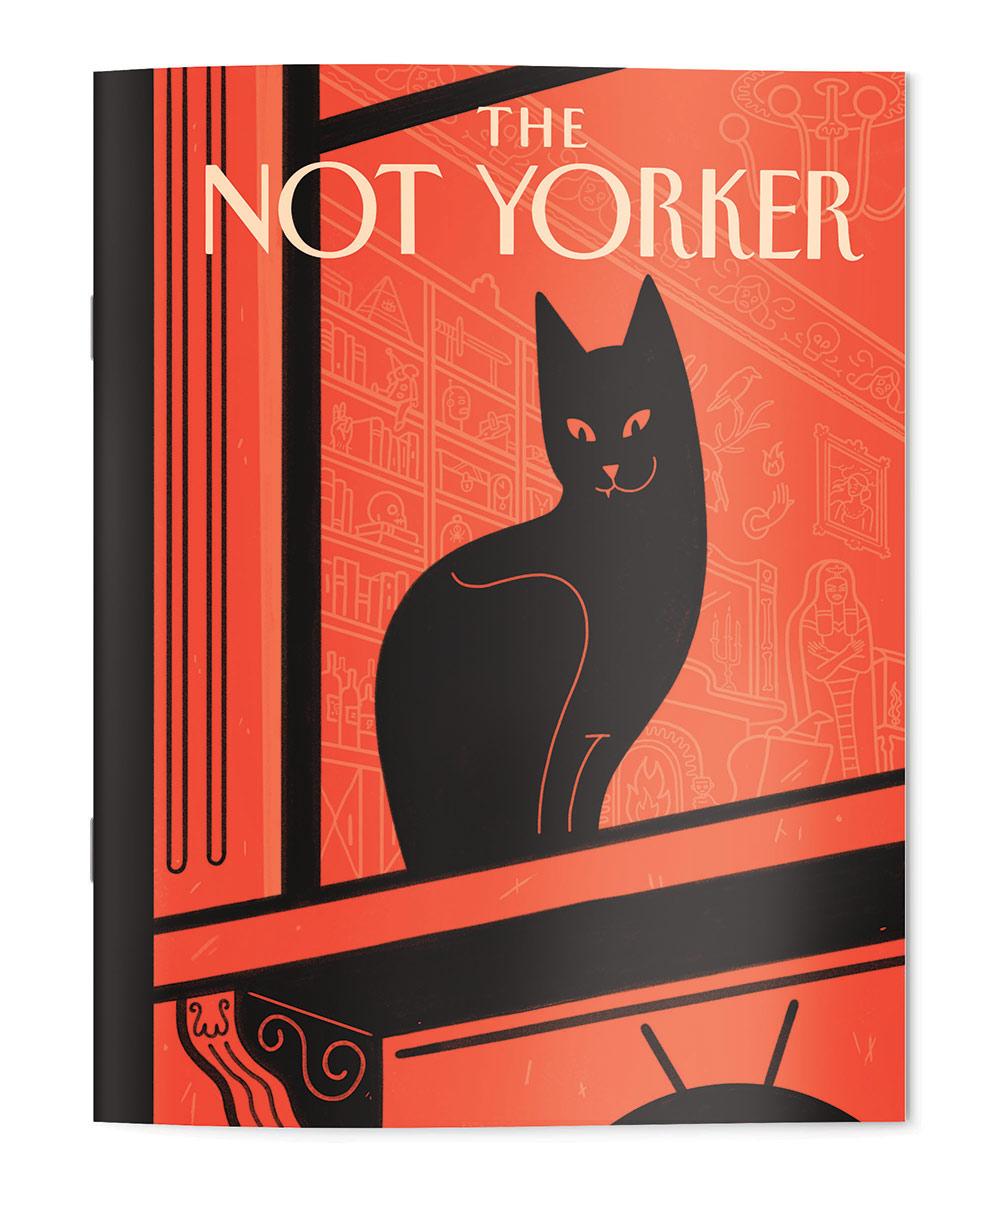 JackDylan_Not_Yorker_HalloweenCat.jpg